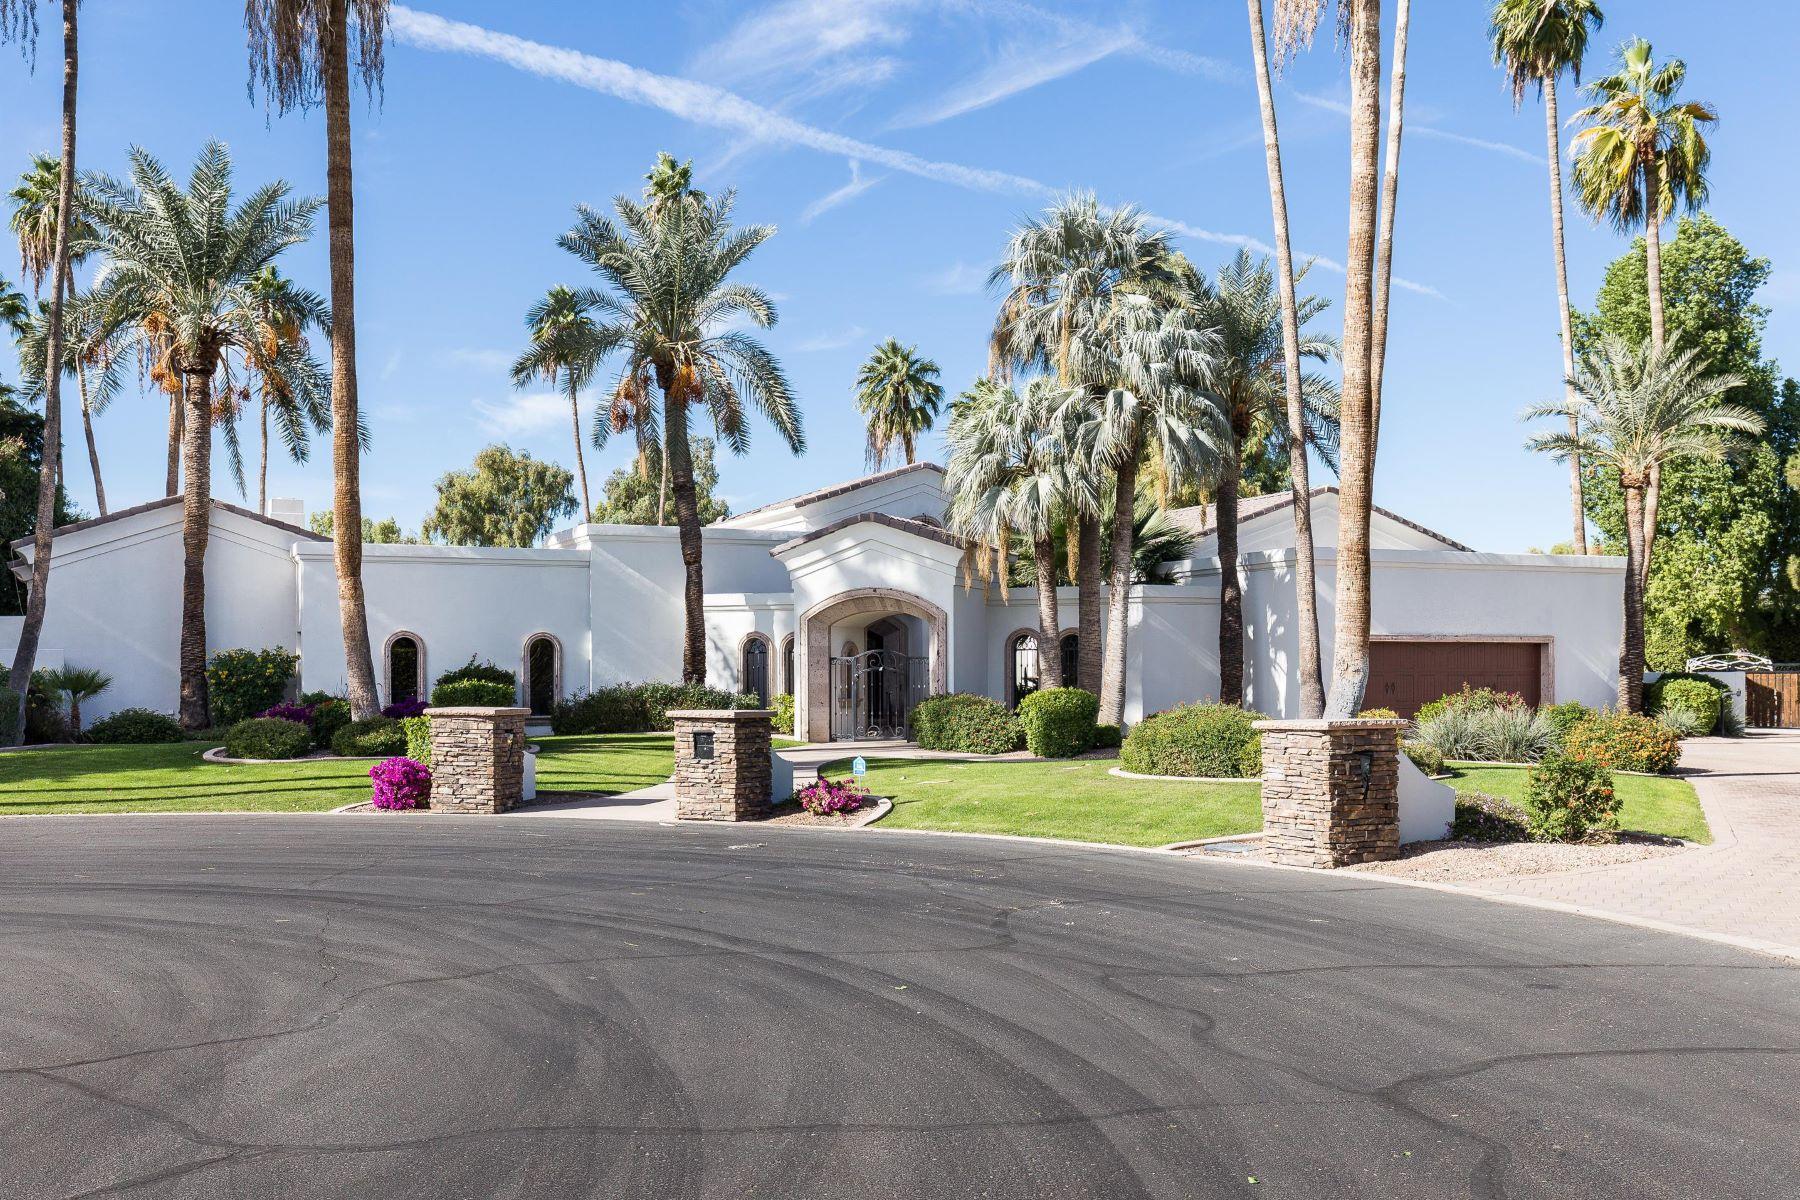 Частный односемейный дом для того Продажа на Paradise Valley home in Camelback Country Club Estates 4 8436 N Golf Dr, Paradise Valley, Аризона, 85253 Соединенные Штаты